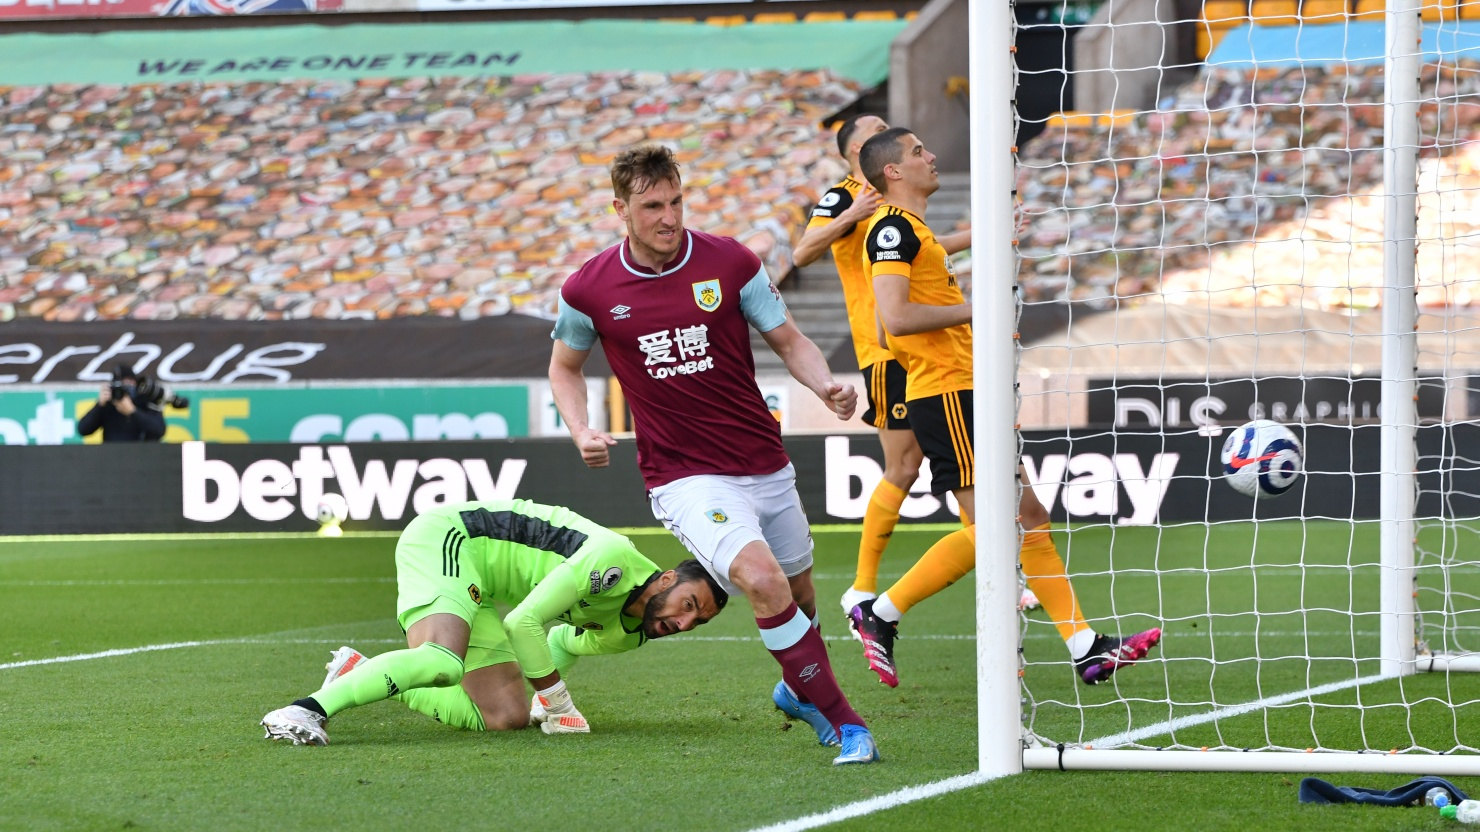 Dyche Hails Goal-den Boy Wood